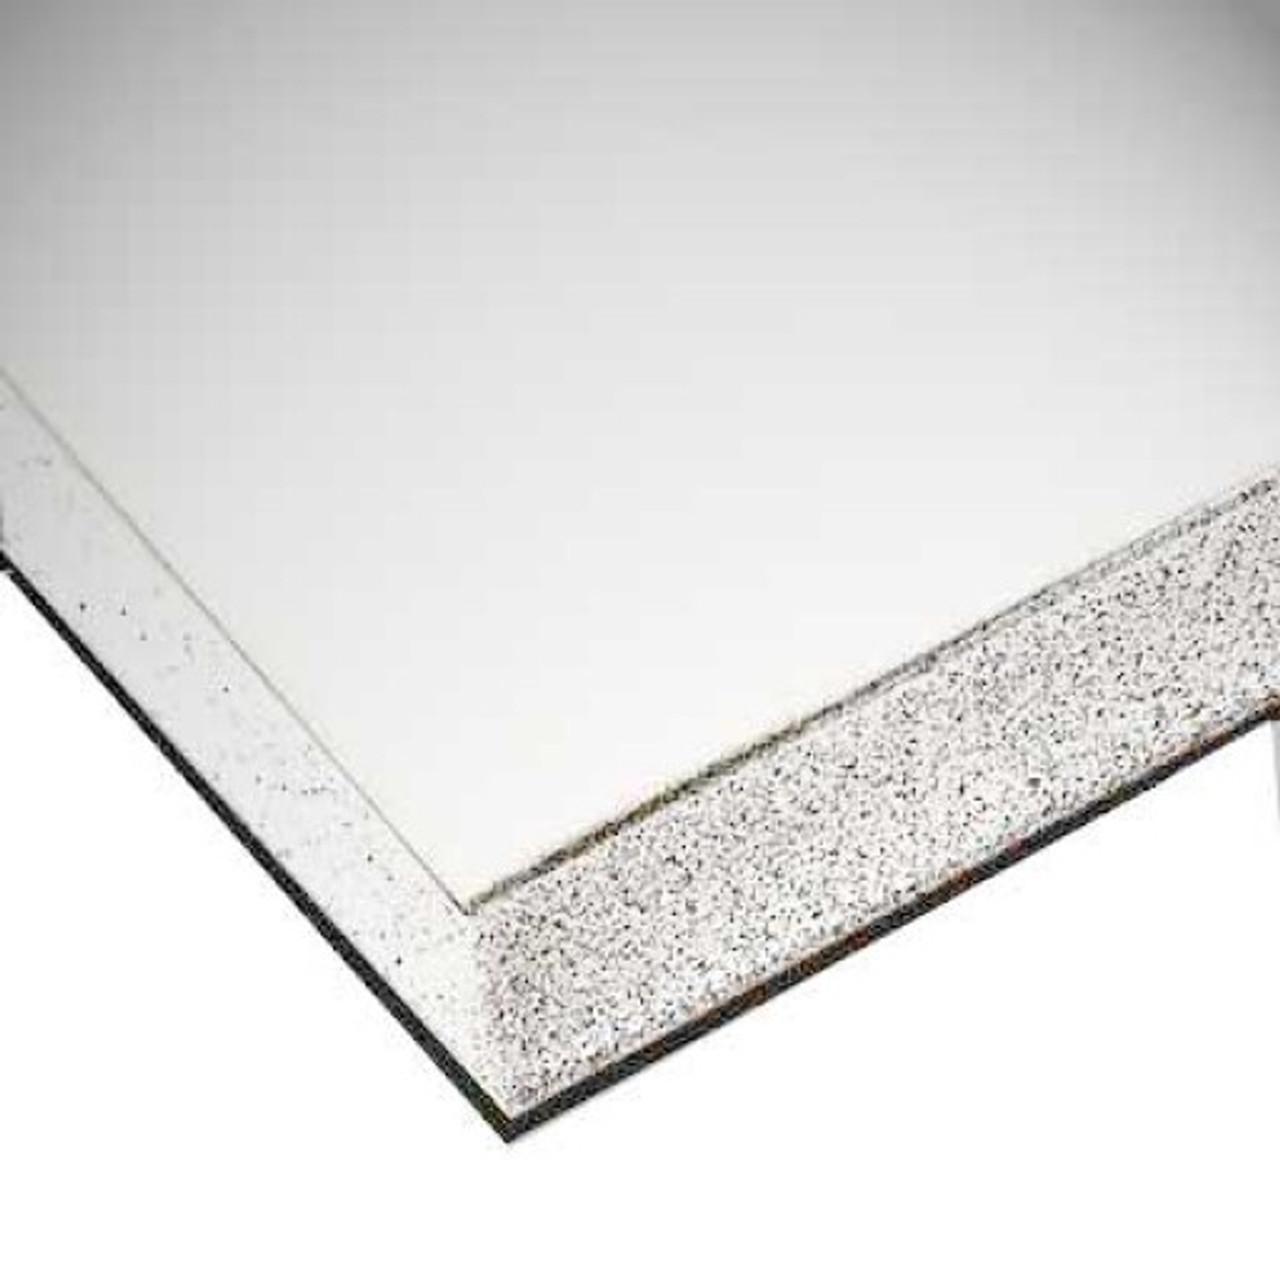 "Gator Board - White - 4' X 8' X 1/2"""